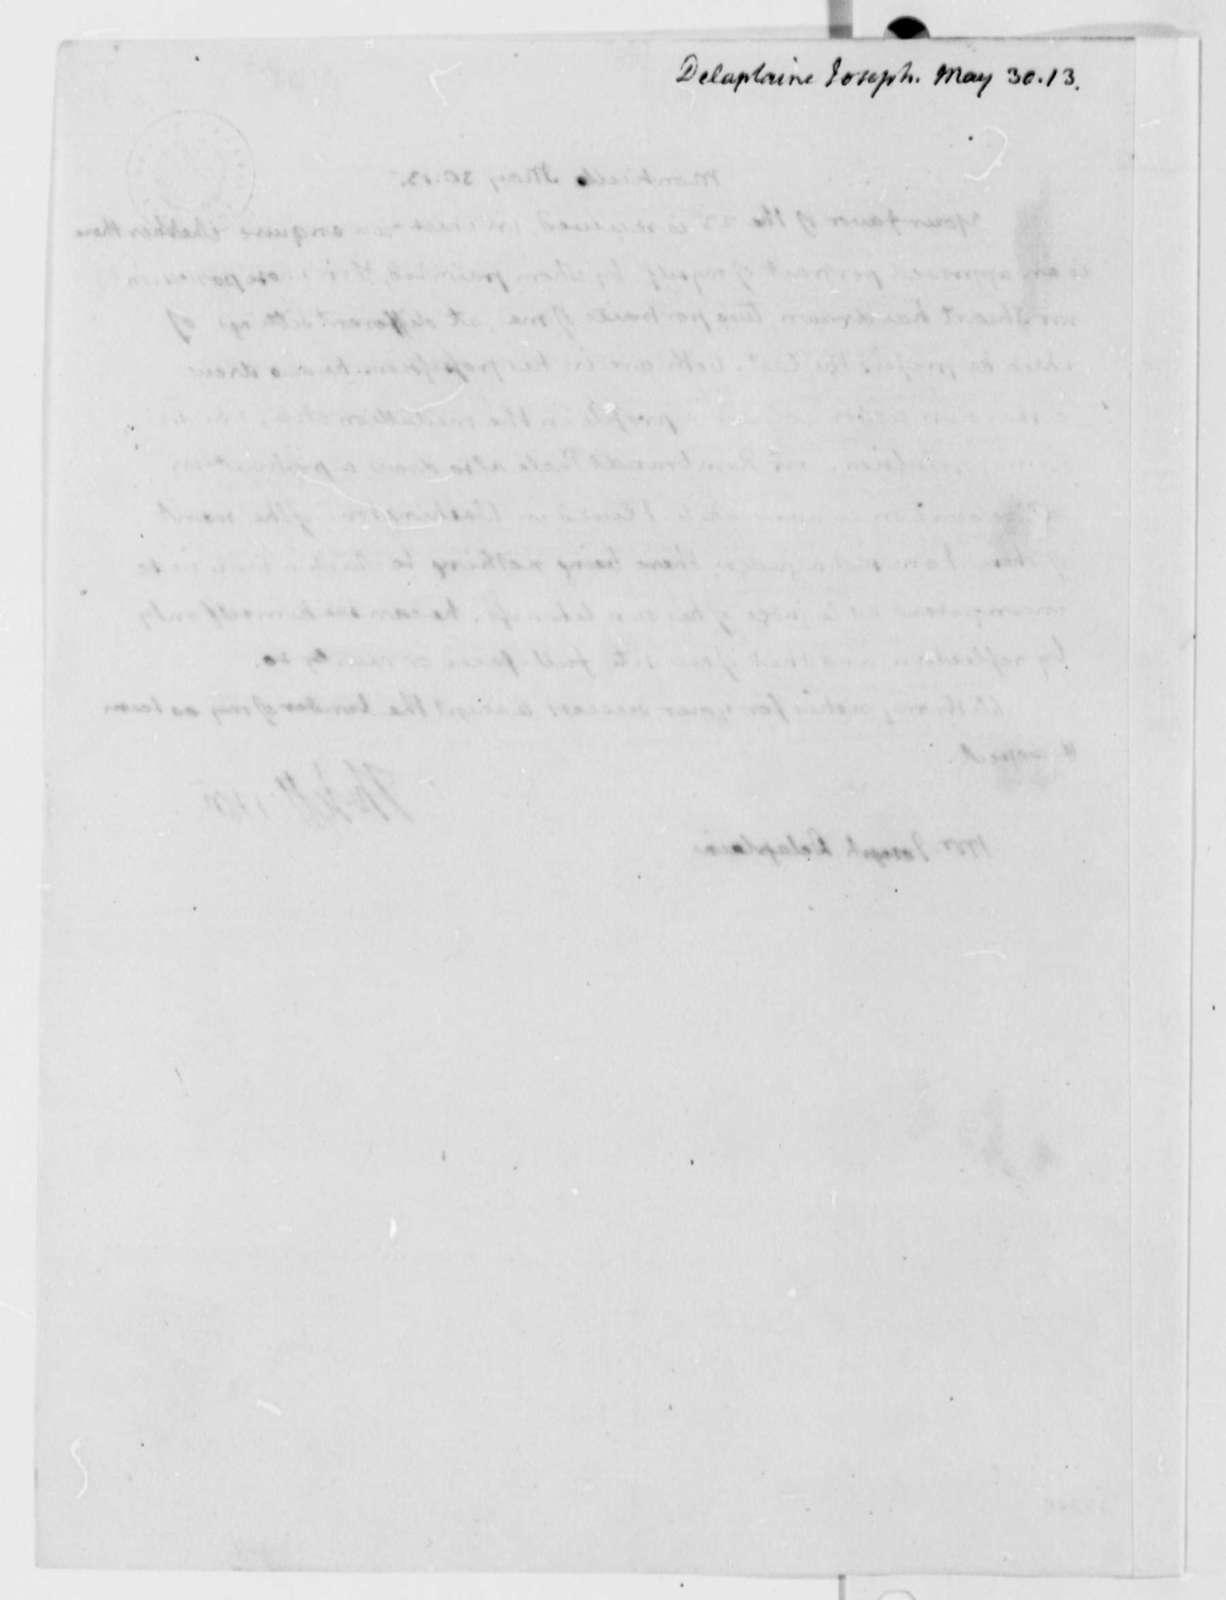 Thomas Jefferson to Joseph Delaplaine, May 30, 1813